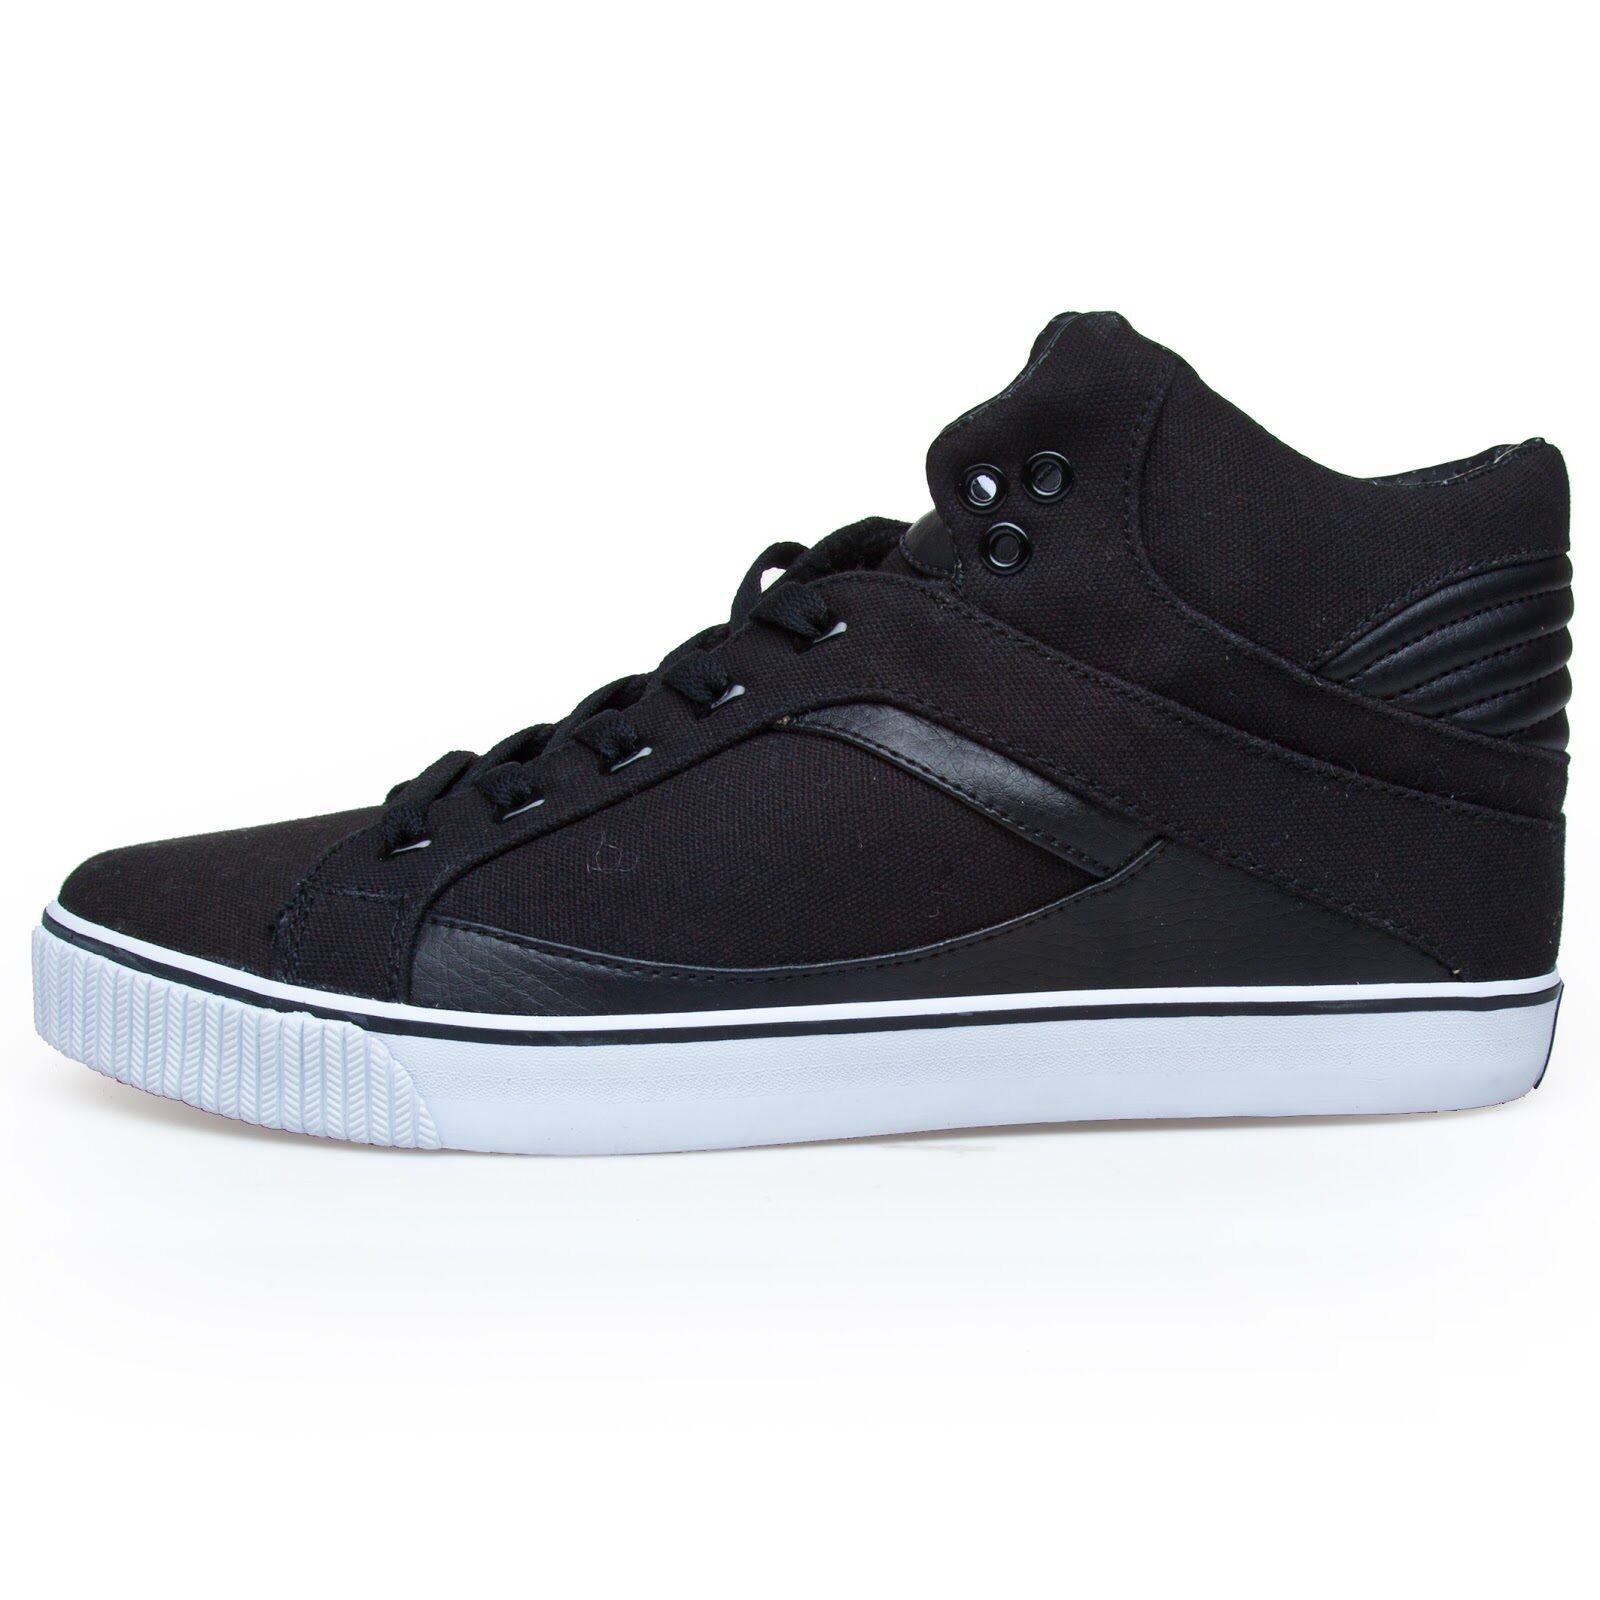 RUN ATHLETICS NYC Unisex Hi Top Sneakers Turnschuhe, EU42, Schwarz, UVP:99